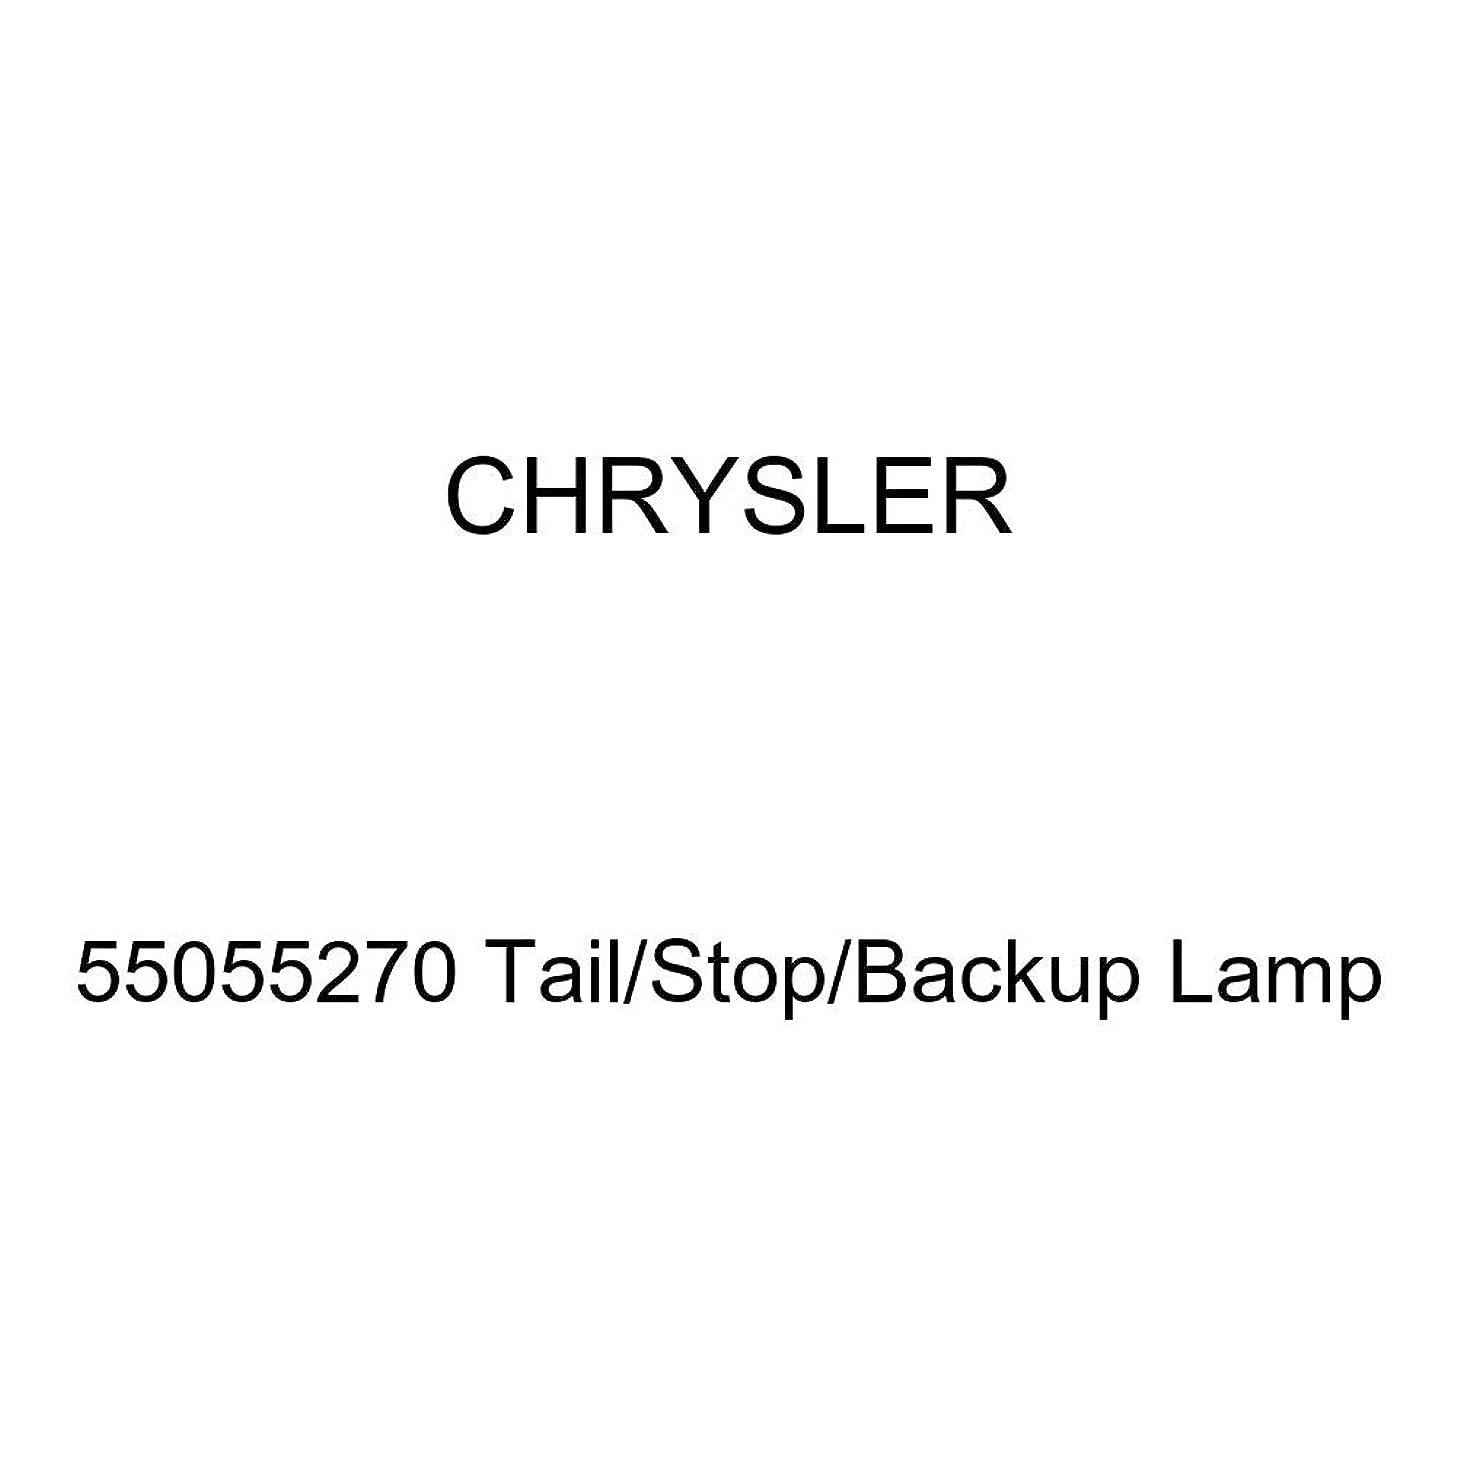 Genuine Chrysler 55055270 Tail/Stop/Backup Lamp